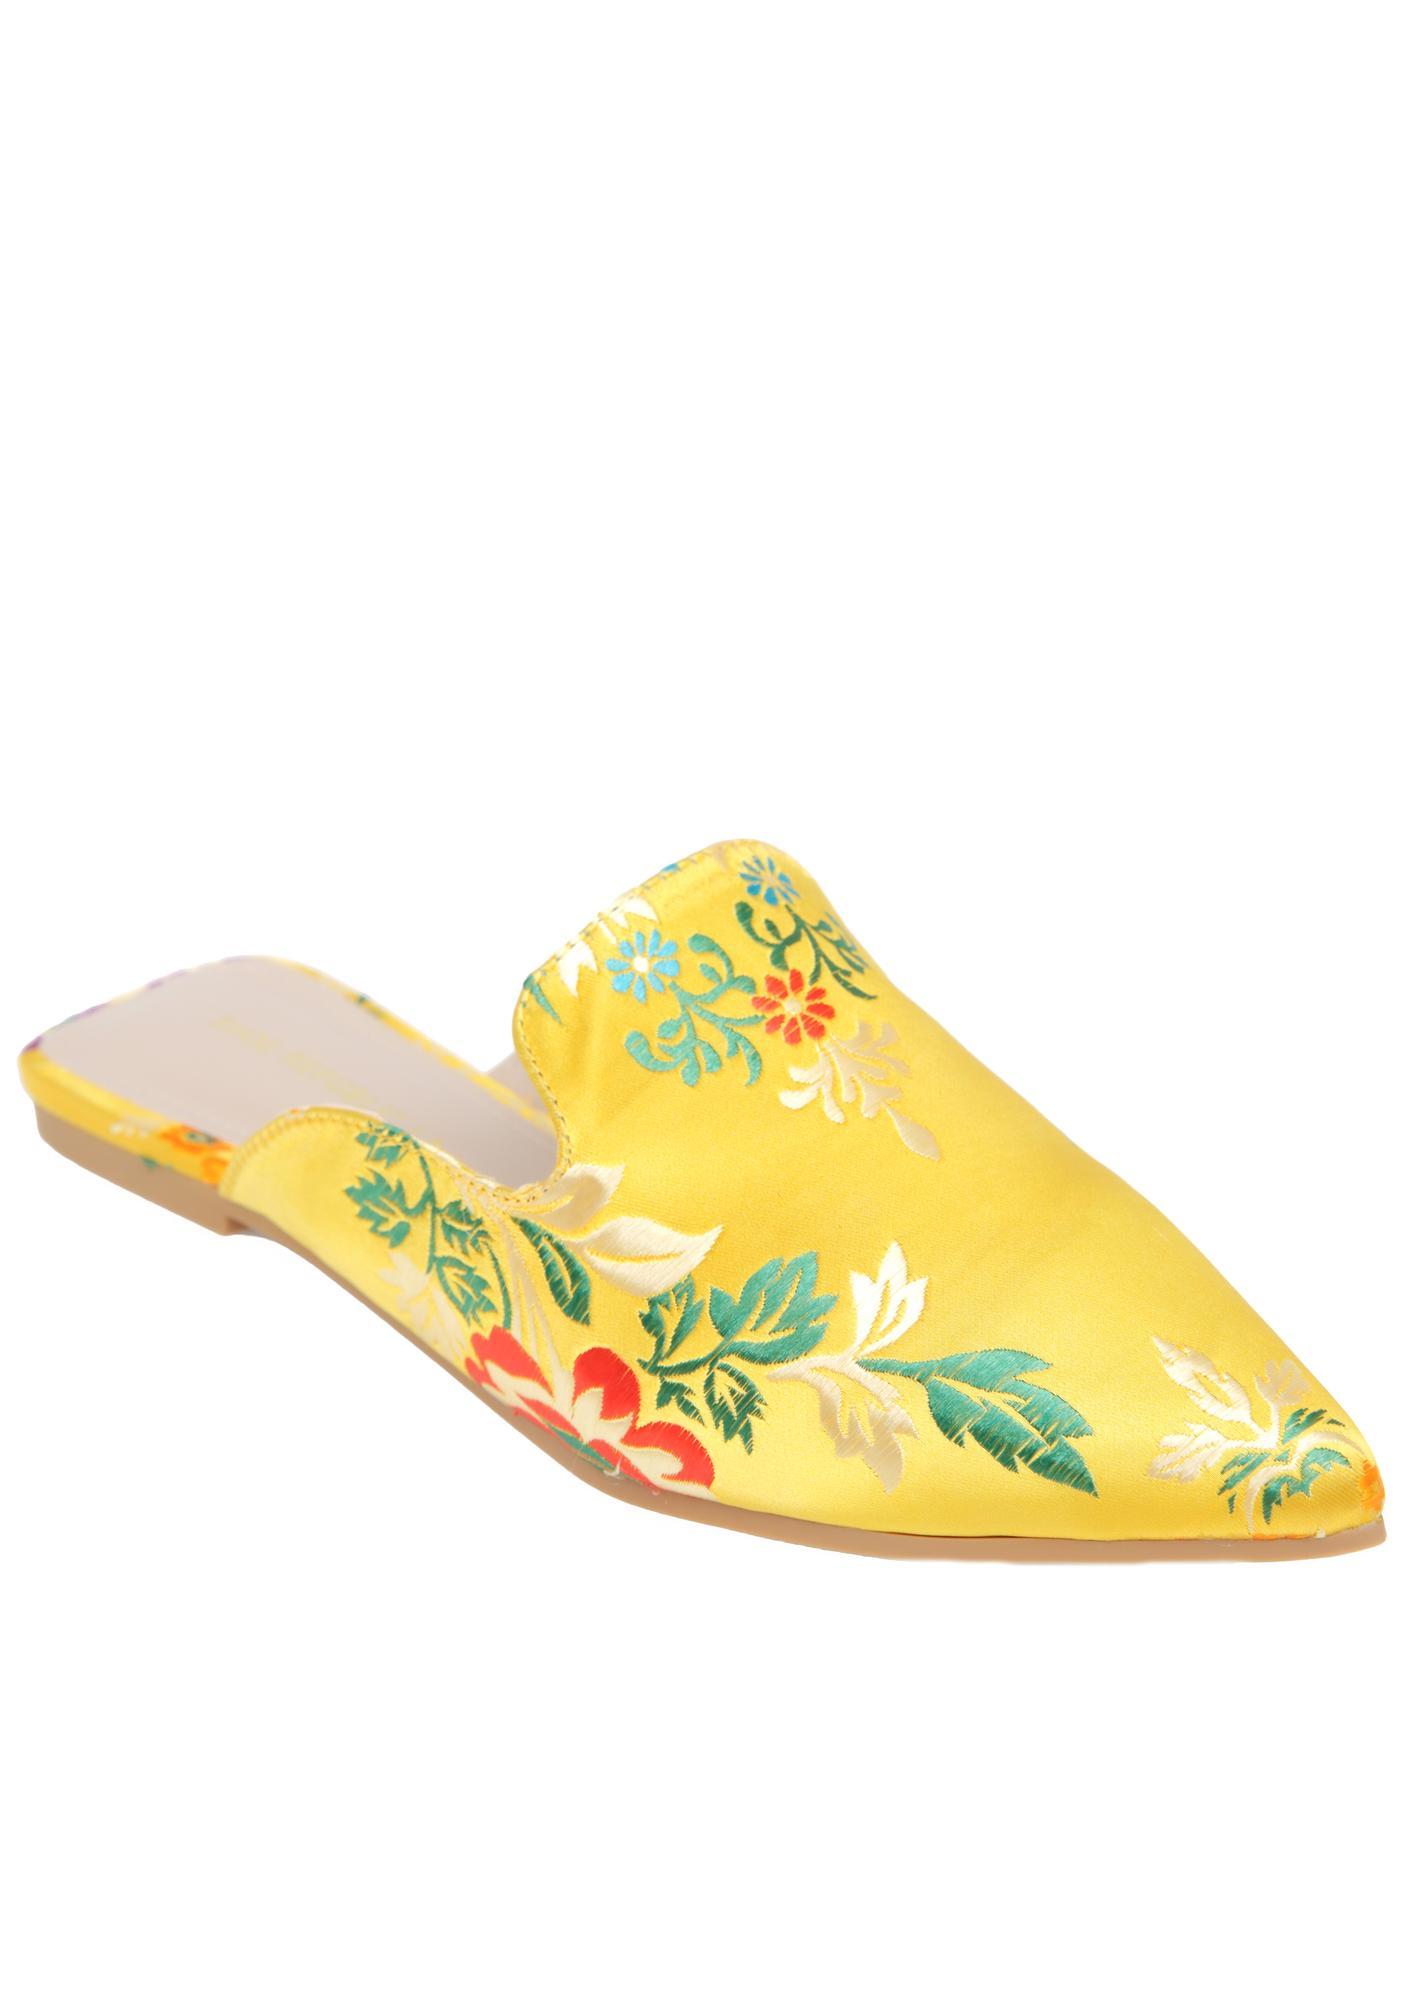 Libertine Brocade Slides